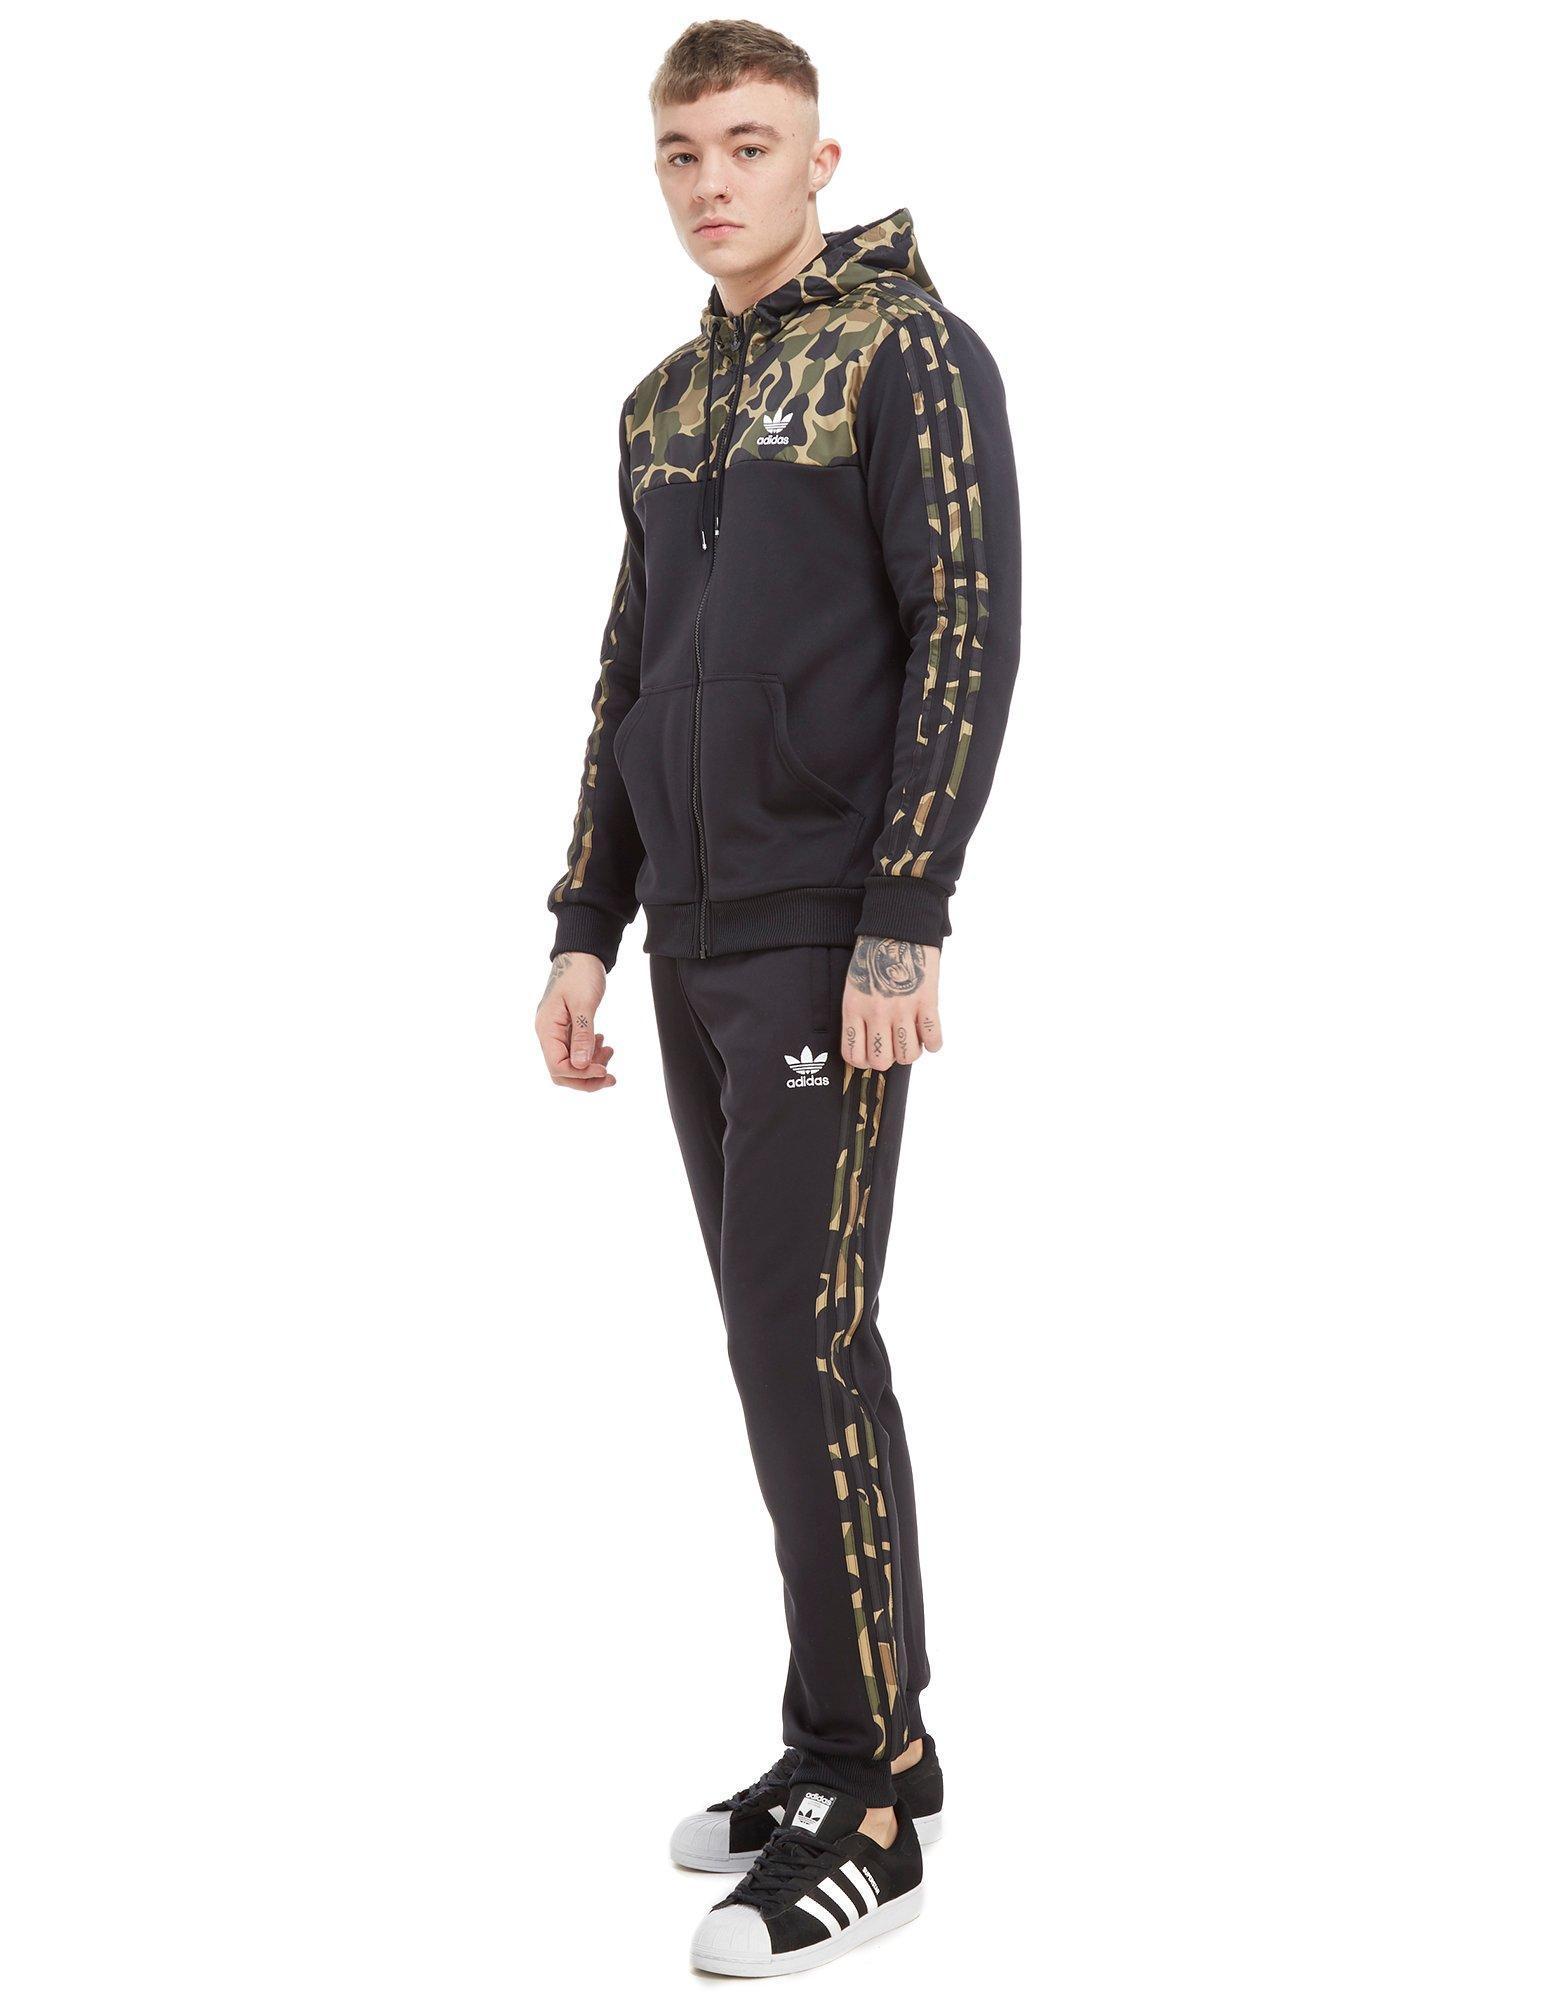 adidas Originals Cotton Trefoil Camo Pants in Black ...